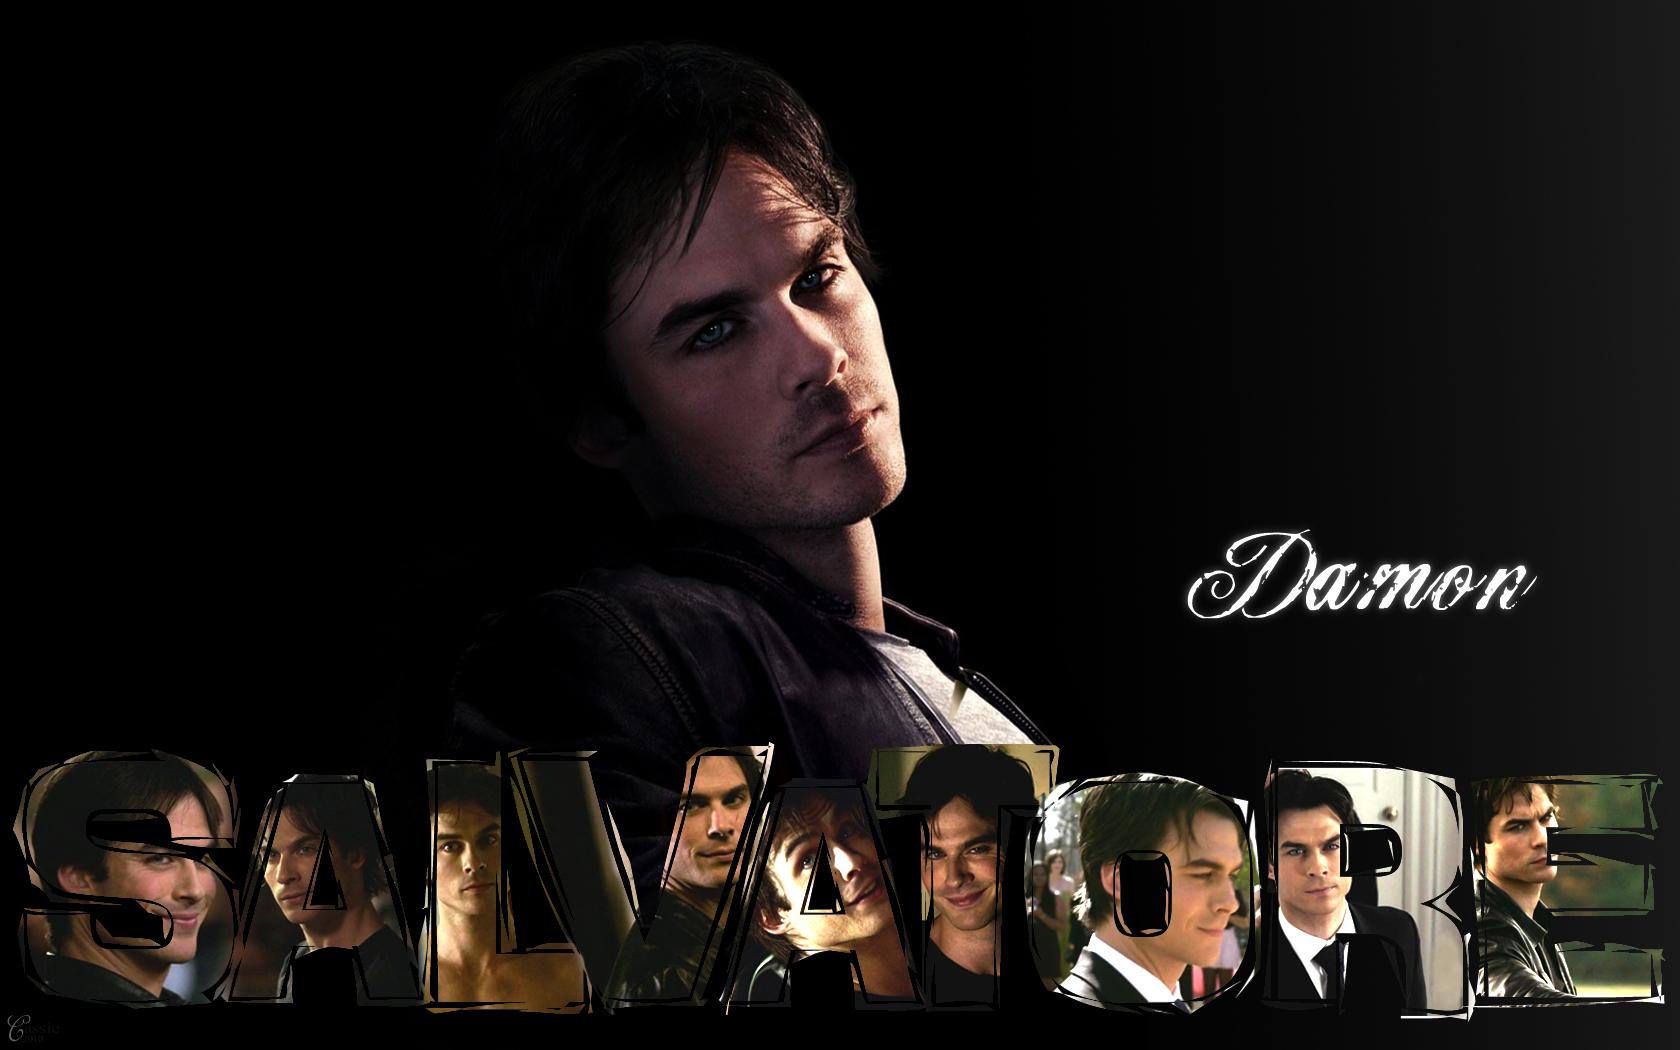 Brand new Desktop Wallpapers for The Vampire Diaries Novel Novice 1680x1050